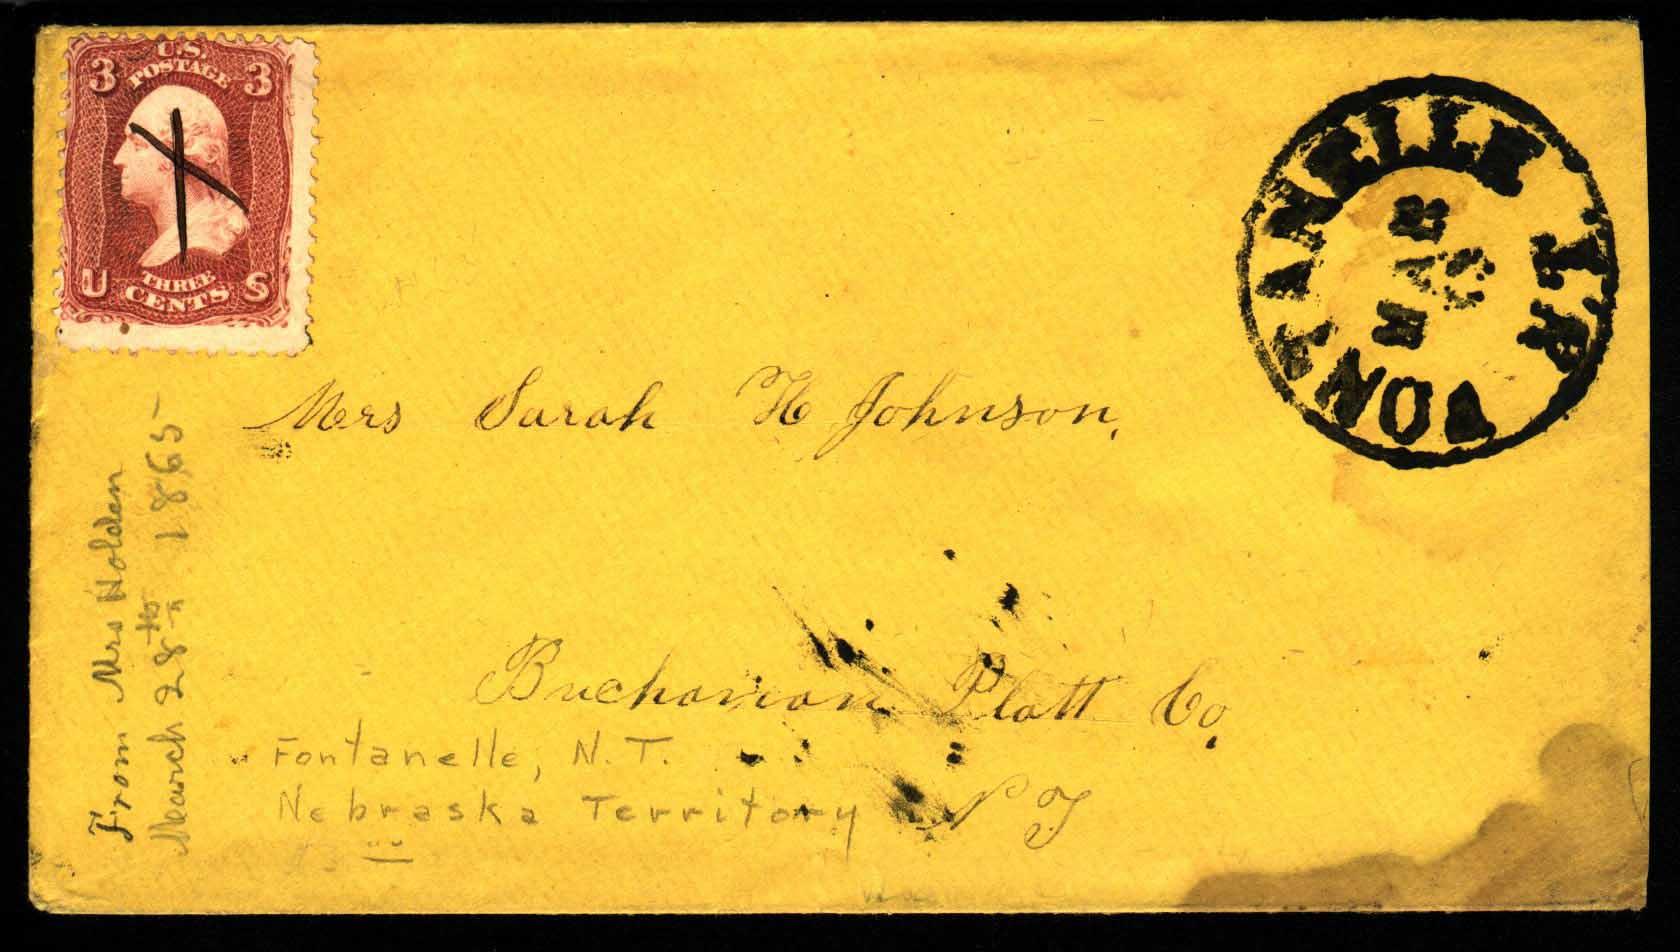 Fontanelle 1865 03 28